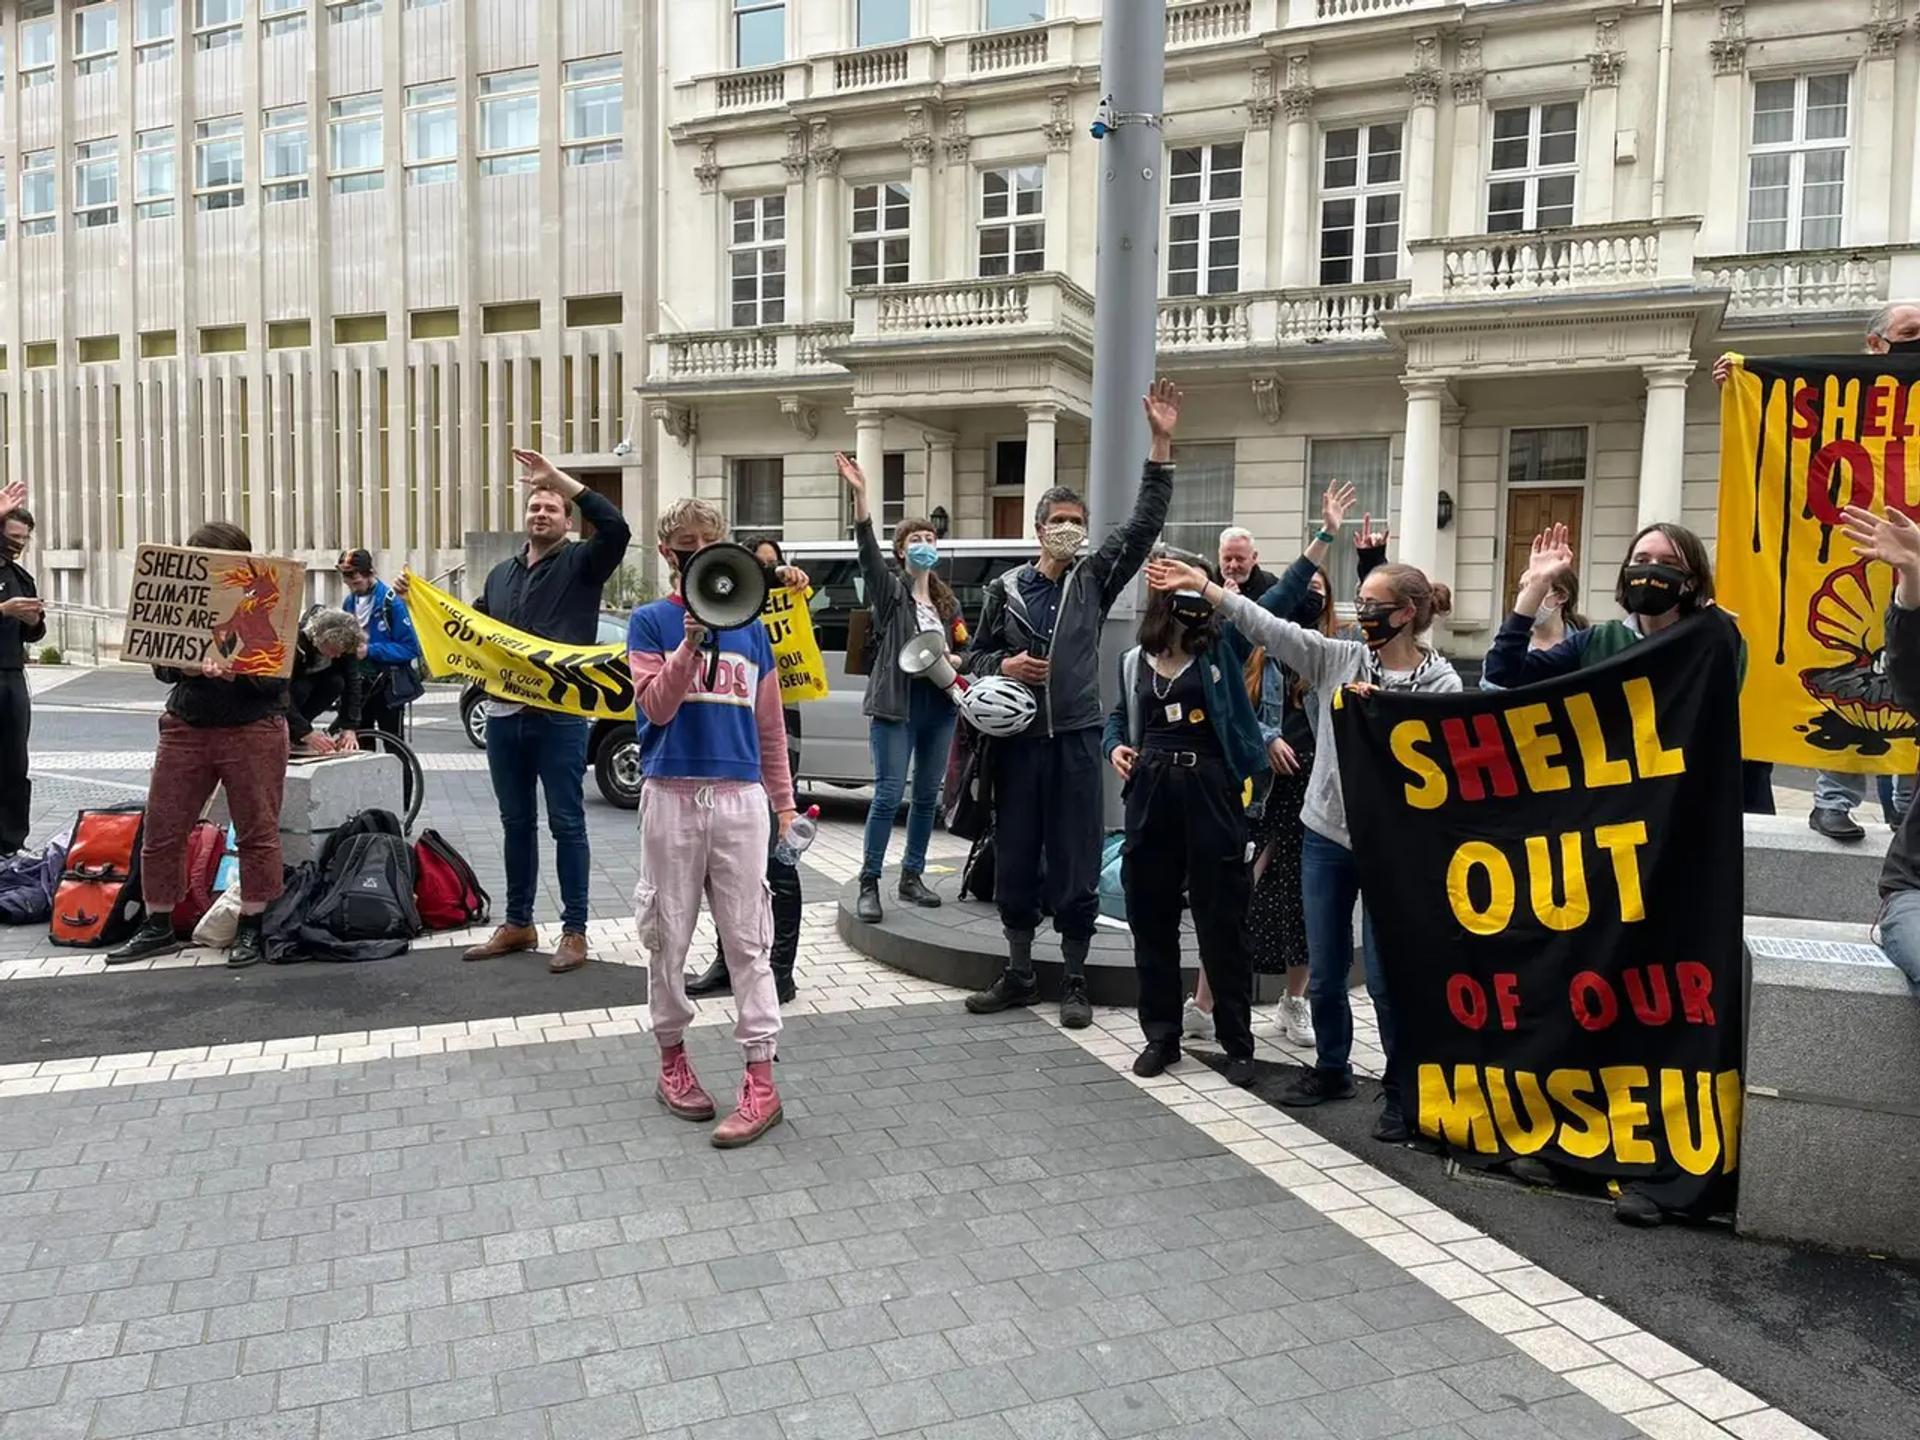 Protestors outside the Science Museum in June © Gareth Harris